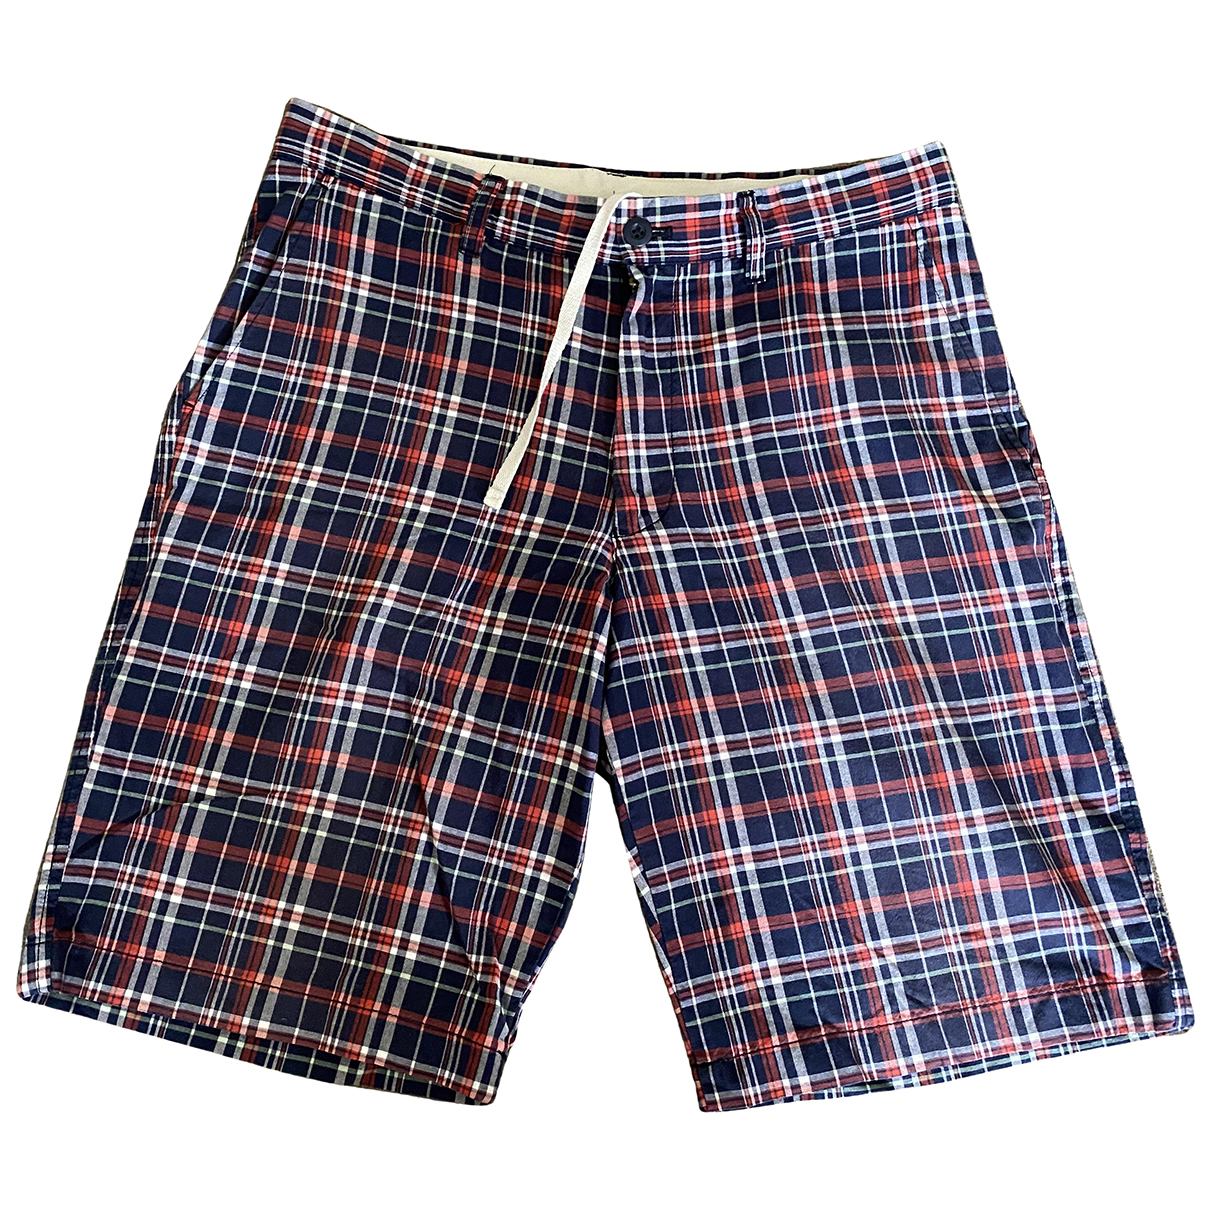 Uniqlo \N Multicolour Cotton Shorts for Men M International